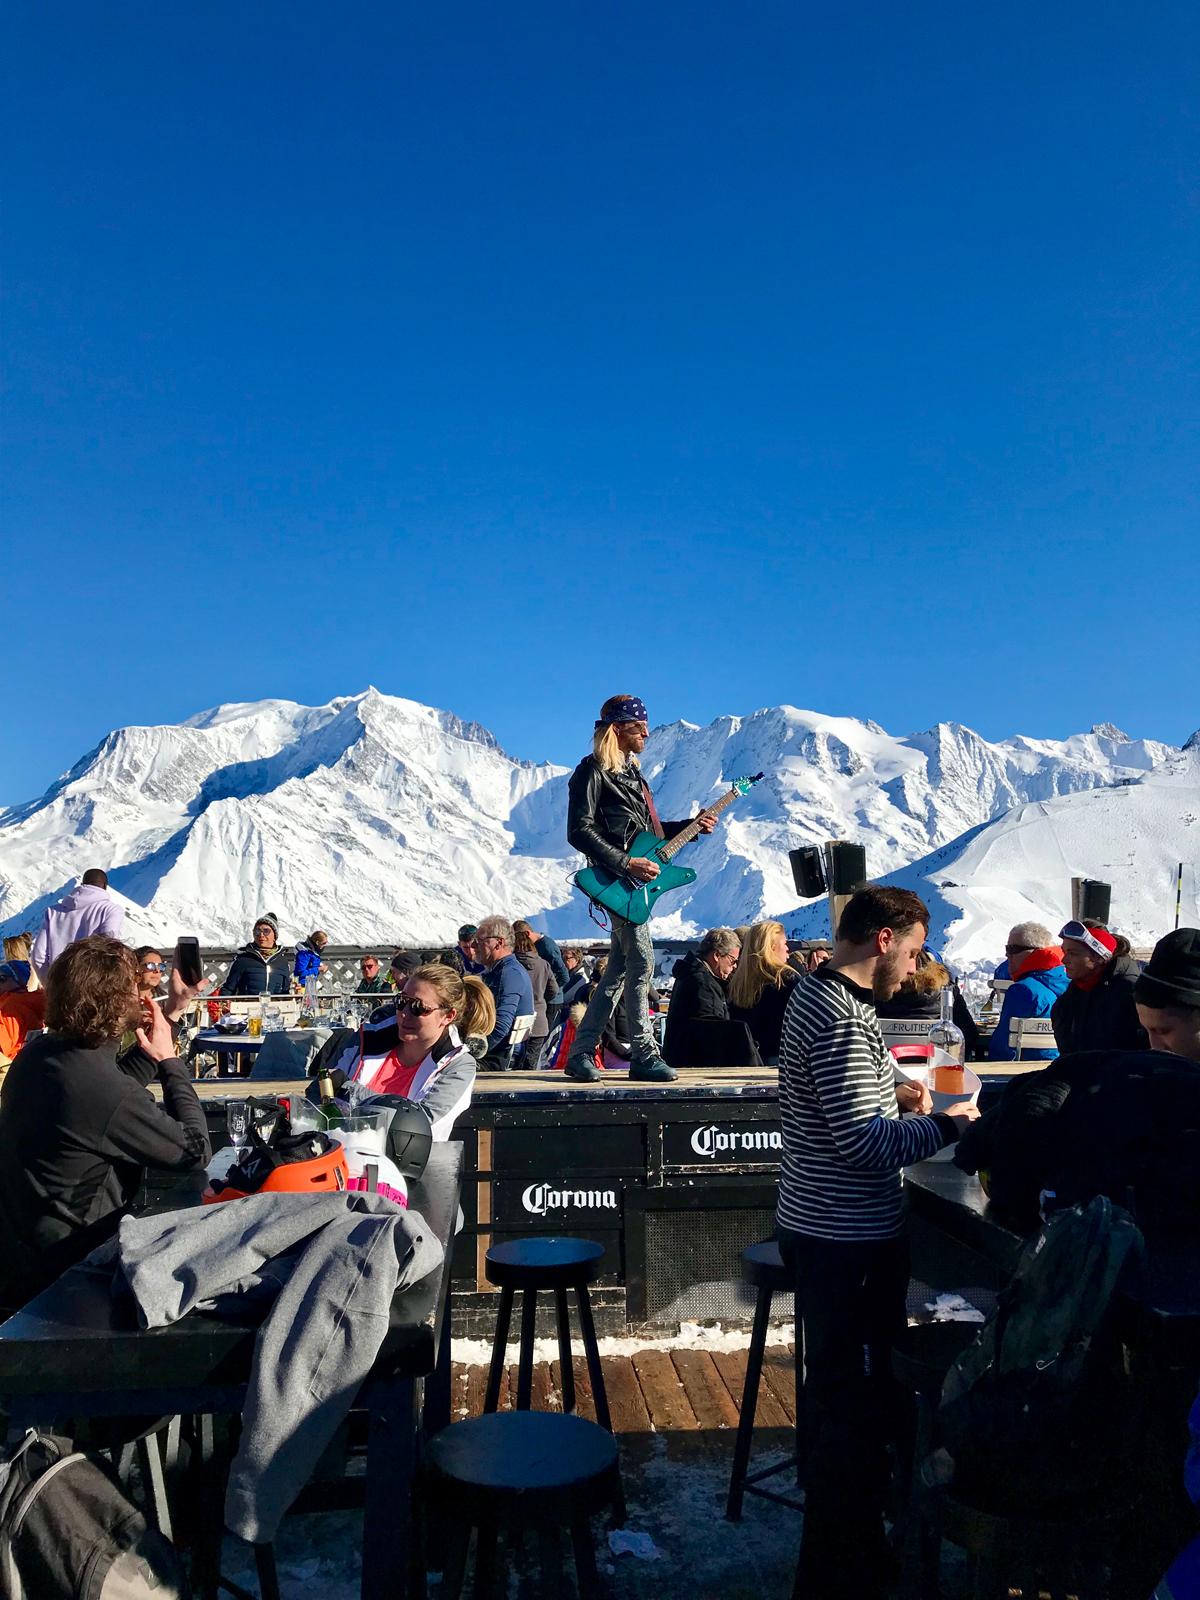 The Folie Douce epic après ski enabled by the chalet nanny